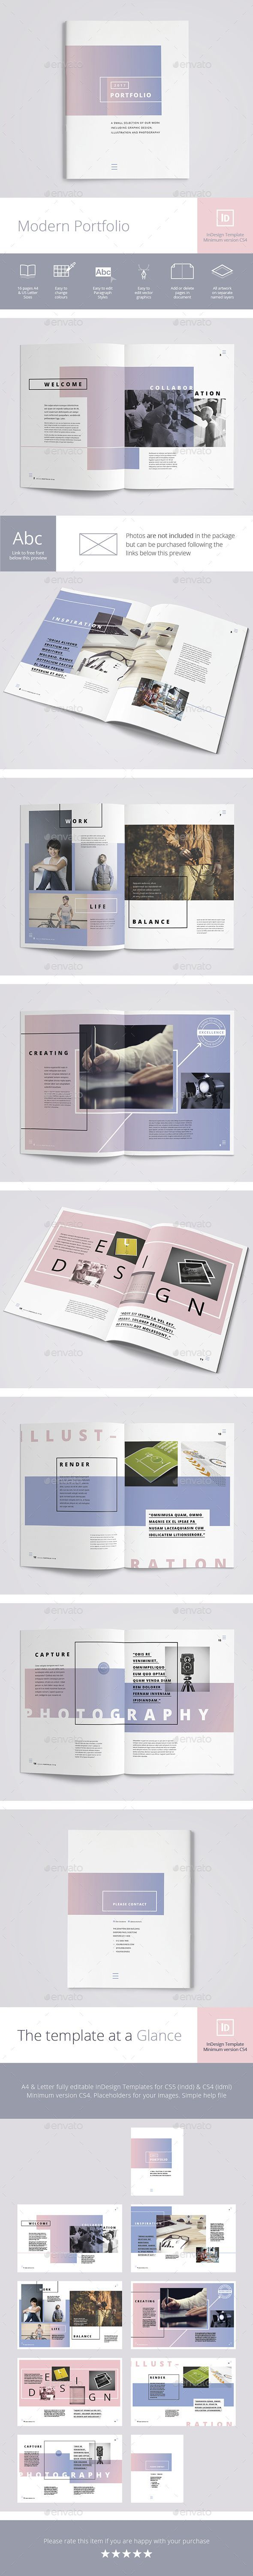 Portfólio moderno Folhetos promocionai InDesign INDD. … – # brochuras #INDD # …   – Kochen